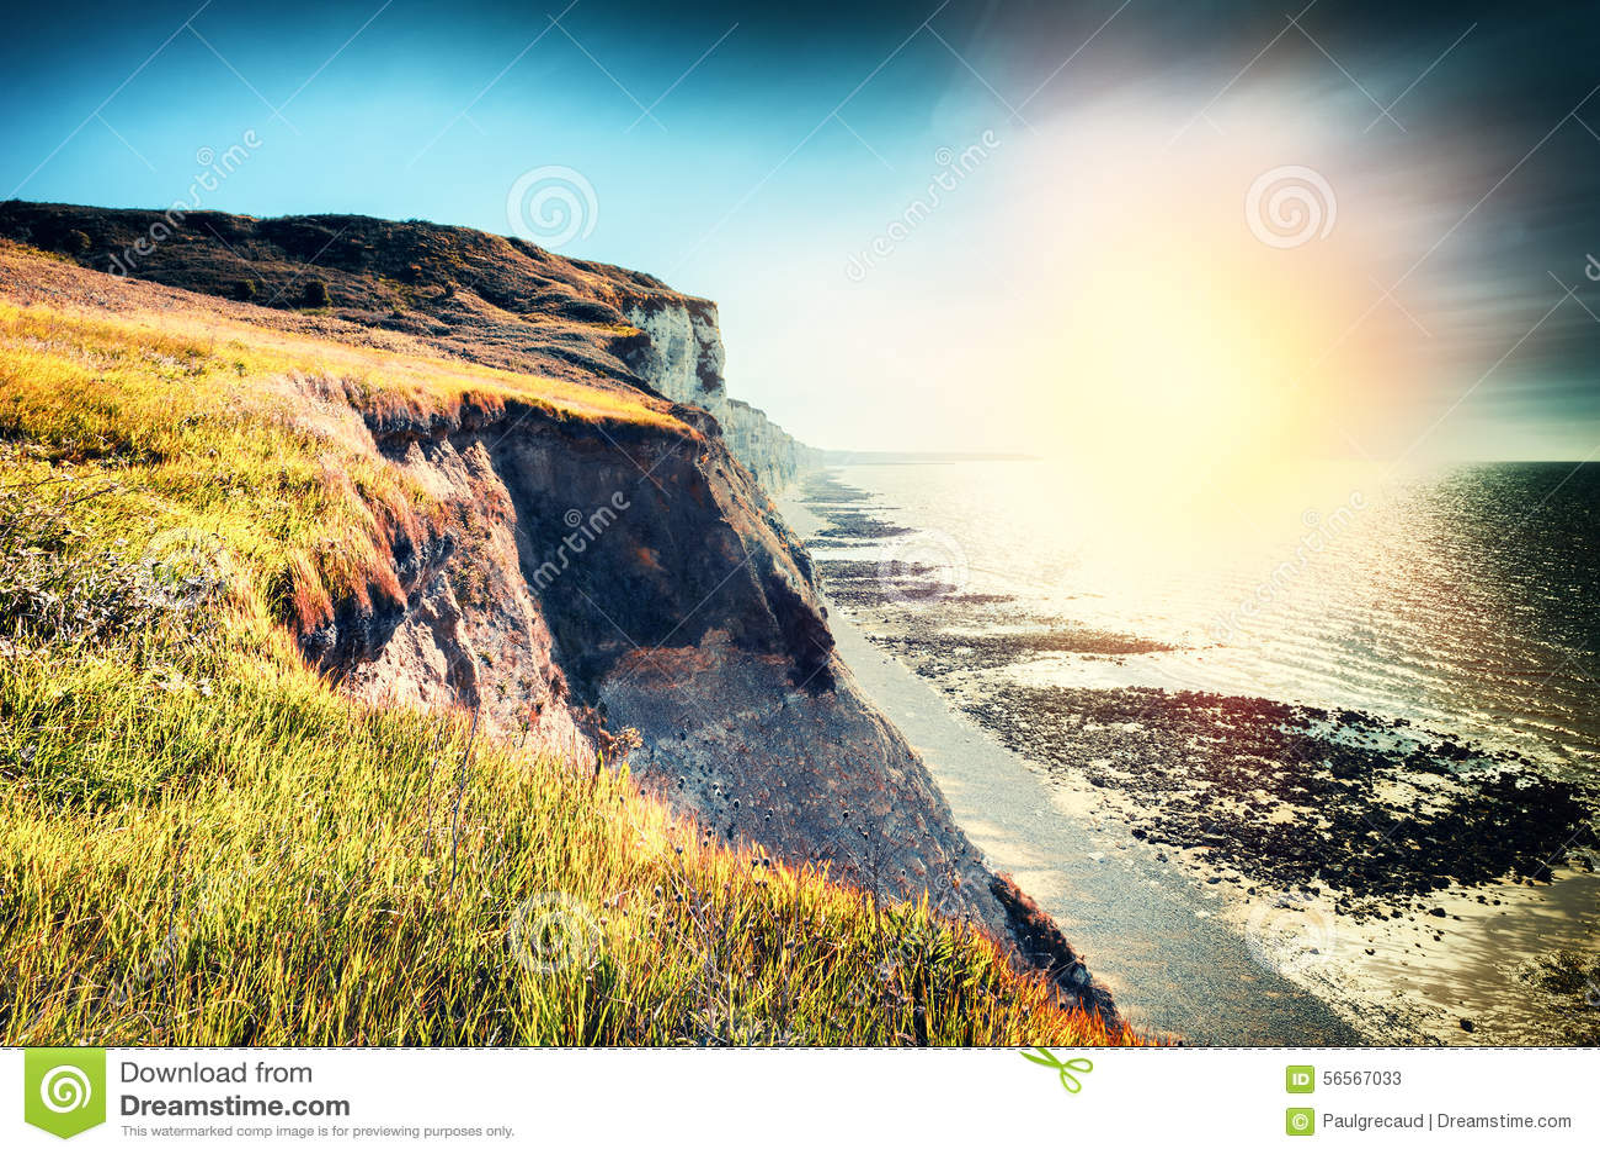 Download Τοπίο με τη δύσκολη ακτή της Βόρεια Θάλασσας Γαλλία Νορμανδία Στοκ Εικόνα - εικόνα από παράκτιος, βακκινίων: 56567033